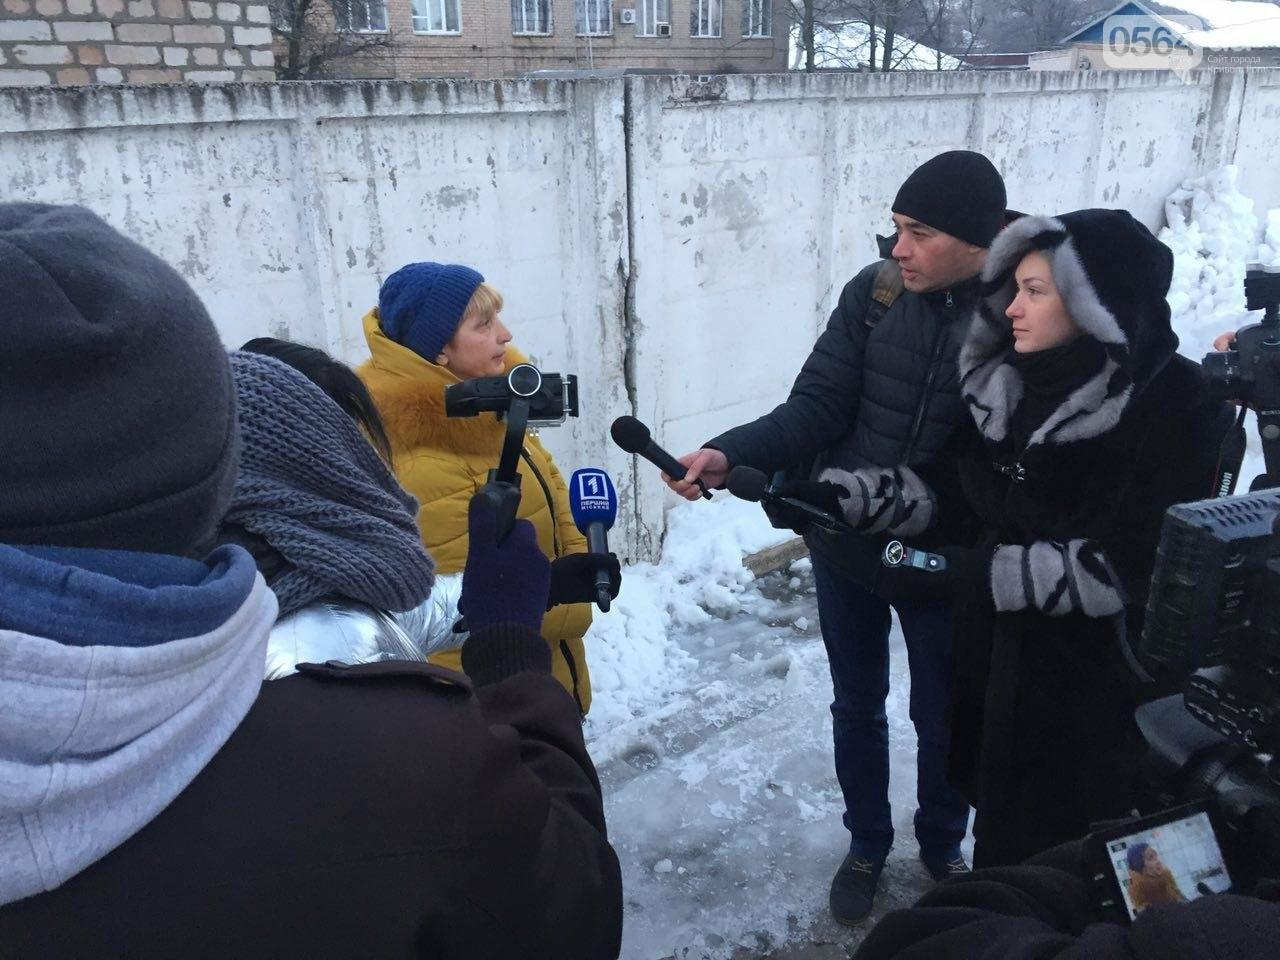 В Кривой Рог вернулся журналист Вячеслав Волк, тяжело раненый во время учений резервистов (ФОТО), фото-11